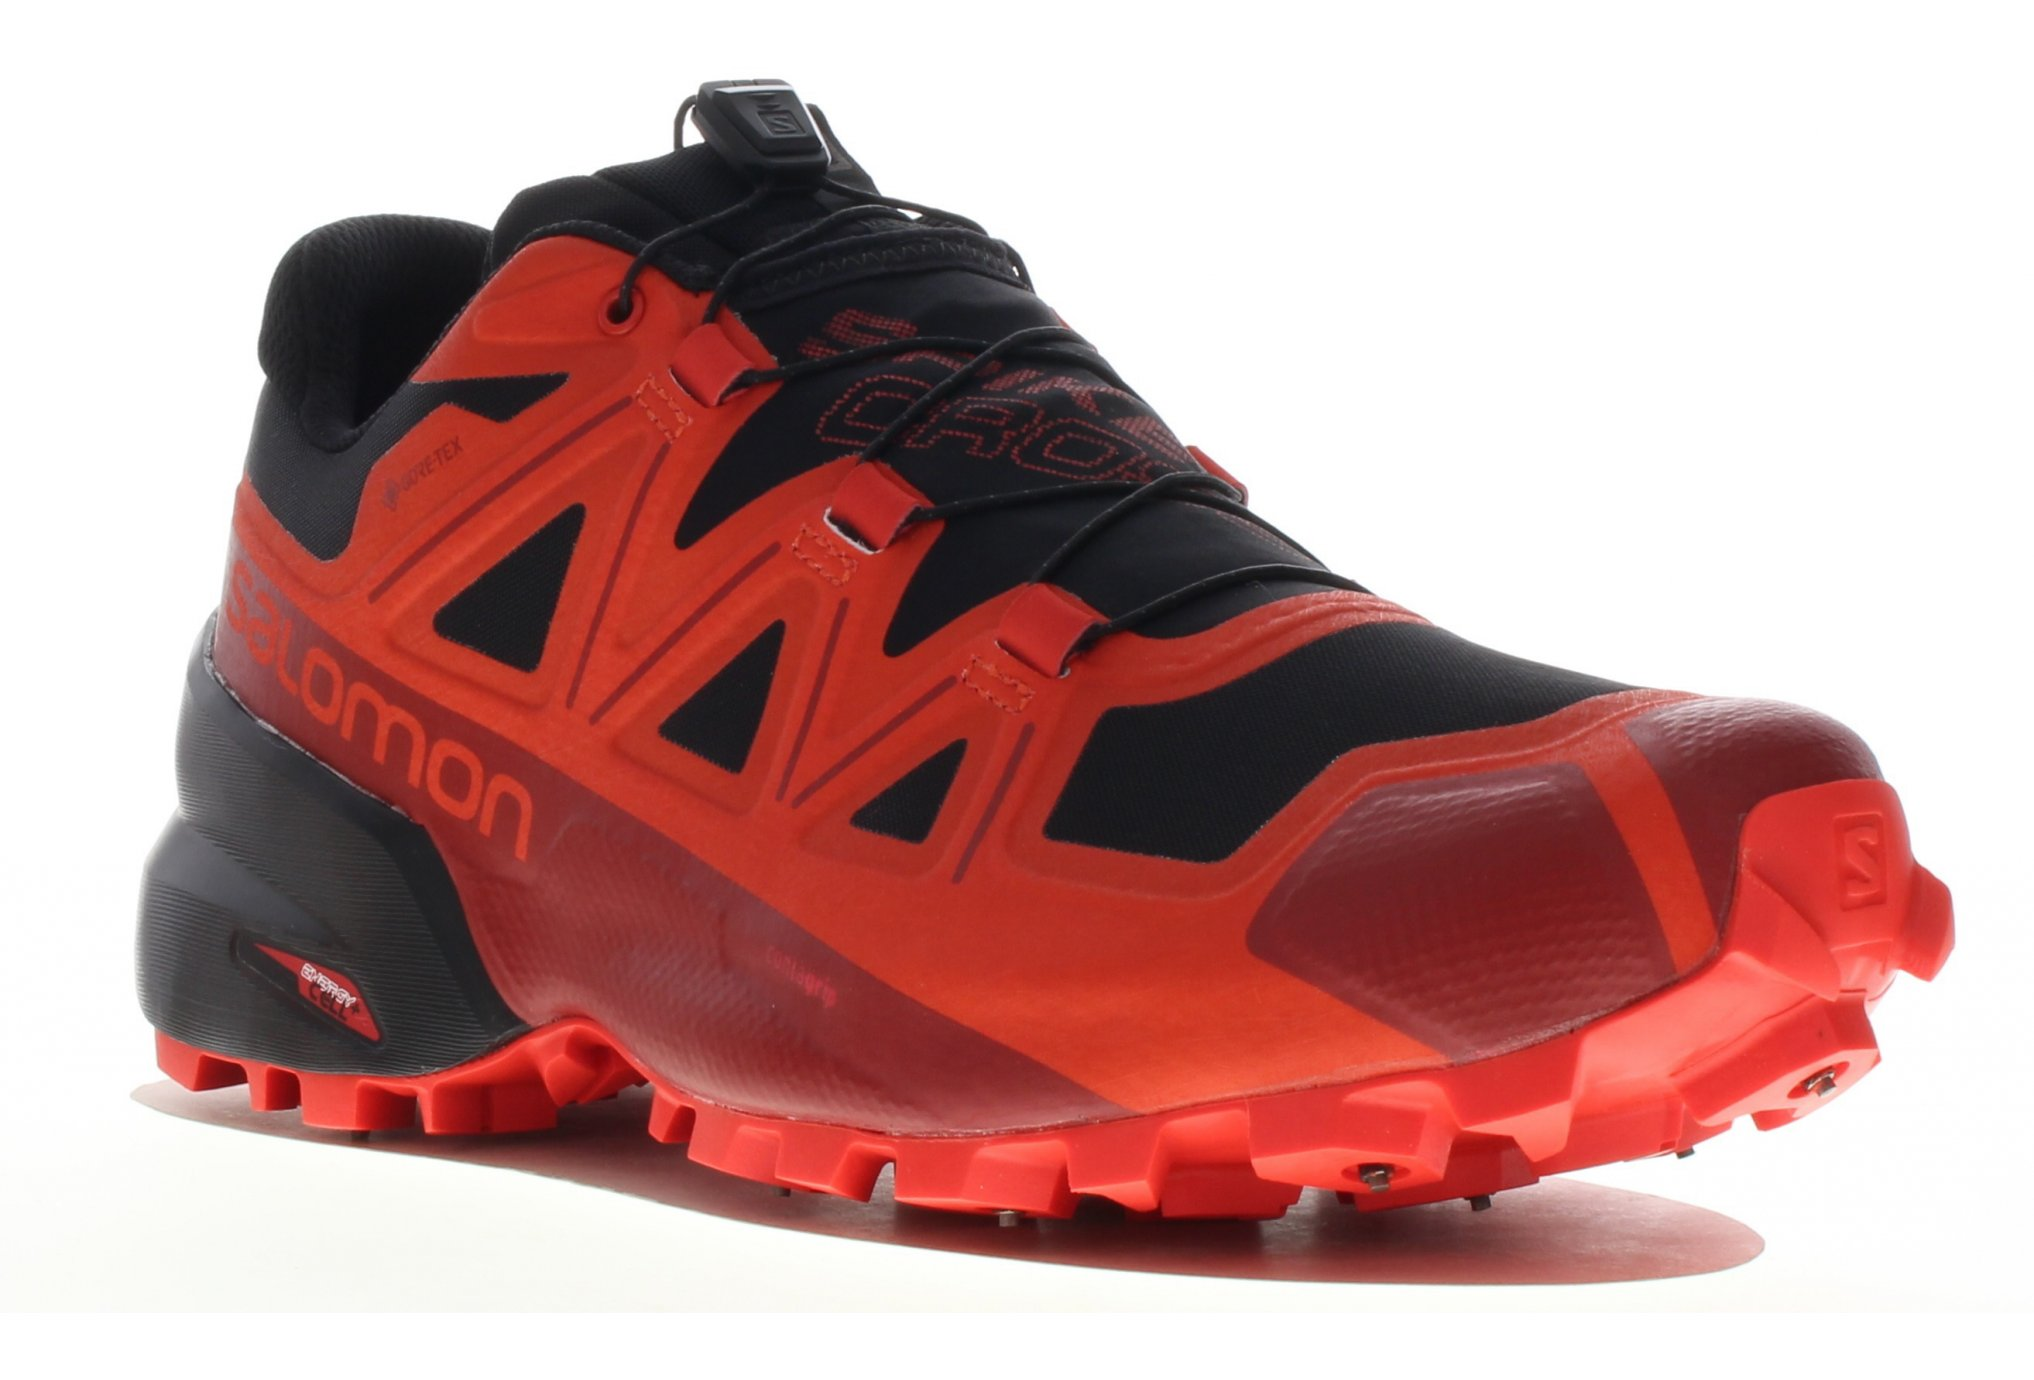 Salomon Spikecross 5 Gore-Tex M Chaussures homme